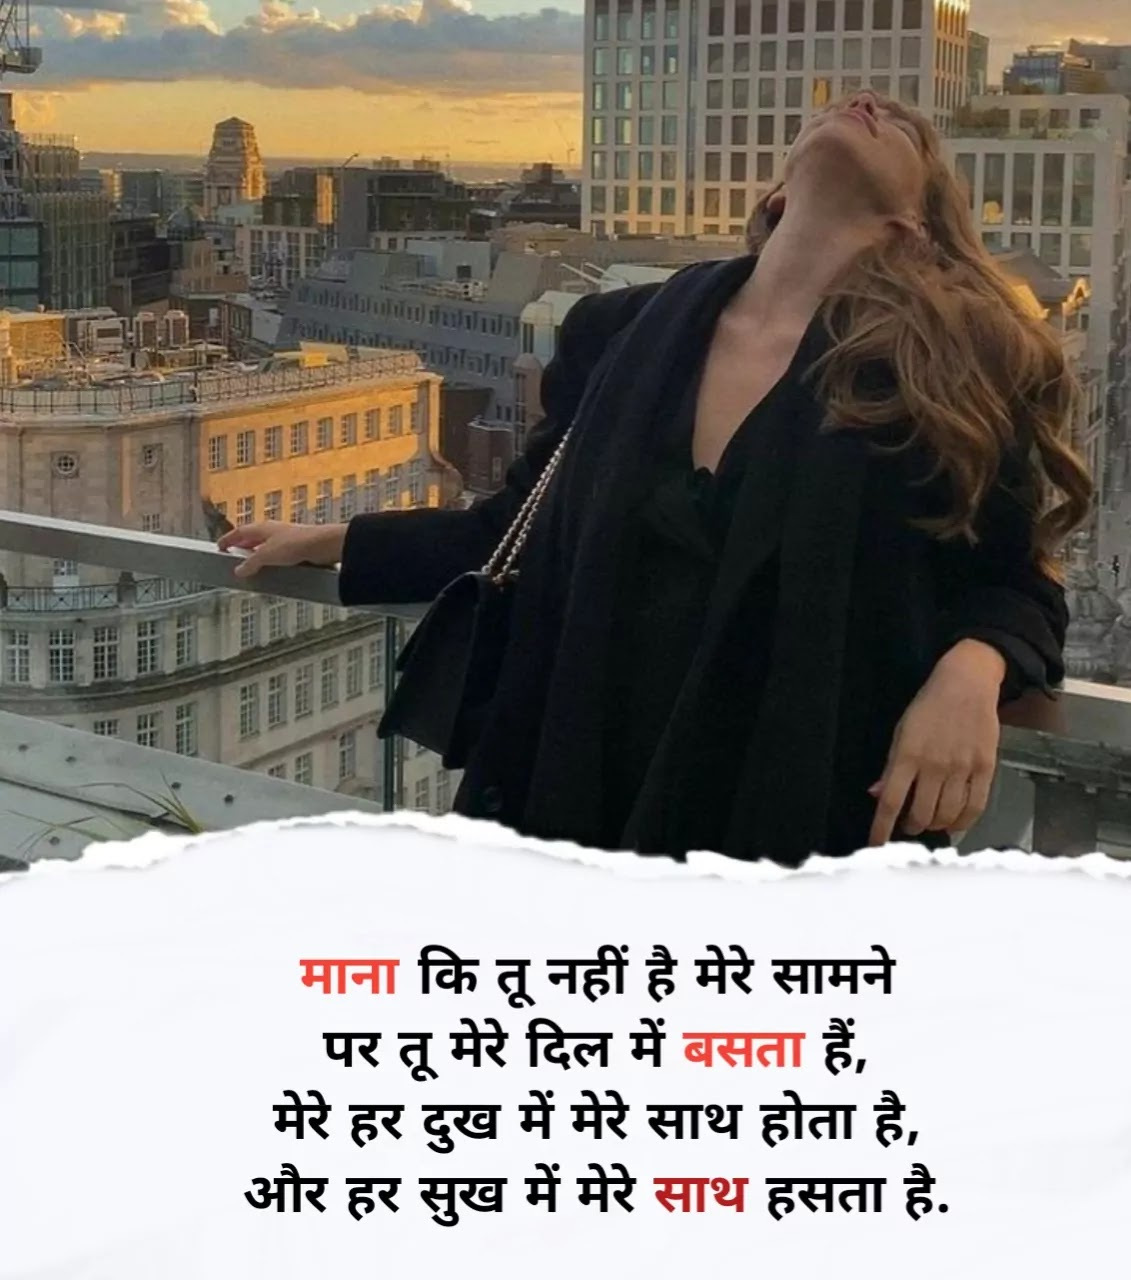 heart touching sad shayari in hindi, heart touching shayari, heart touching shayari in hindi, heart touching breakup shayari, heart touching love shayari, heart touching sad lines in hindi, heart touching sad shayari, best heart touching shayari, heart touching shayari in hindi 2 lines, emotional heart touching shayari, heart touching love shayari in hindi, love heart touching shayari in hindi, very heart touching sad shayari, very heart touching shayari, heart shayari in hindi, heart touching emotional shayari, love heart shayari, hard touching shayari, touching shayari, best heart touching shayari in hindi, heart touching romantic shayari, new heart touching shayari, hard touch shayari, heart touching 2 lines in hindi, heart touching shayari for love, sad heart touching lines in hindi, romantic heart touching shayari, shayari heart touching hindi, heart touching shayari for gf, heart touching sad shayari in hindi for girlfriend, heart touching love status in hindi, heart touching shayari status, heart touching shayari love, hot touching shayari, breakup heart touching shayari, sad heart touching status in hindi, very sad heart touching shayari, heart touching shayari on life, very heart touching sad shayari in hindi, heart touching goodbye shayari in hindi, most heart touching shayari, heart touching gulzar shayari, heart touching emotional sad shayari, sad heart shayari, life heart touching shayari, heart shayari love, heart touching whatsapp status in hindi, broken heart touching shayari, love touching shayari, attitude heart touching shayari, heart touching shayari sad, love heart touching status in hindi, heart touching mirza ghalib shayari in hindi, shayari heart touching sad, heart feel shayari, 2 lines heart touching shayari, sad life quotes in hindi for whatsapp status, sad status in hindi for life, sad status in hindi for life partner, sad zindagi status in hindi, life sad status in hindi, sad life status hindi, sad status in hindi for life 2 line, sad st